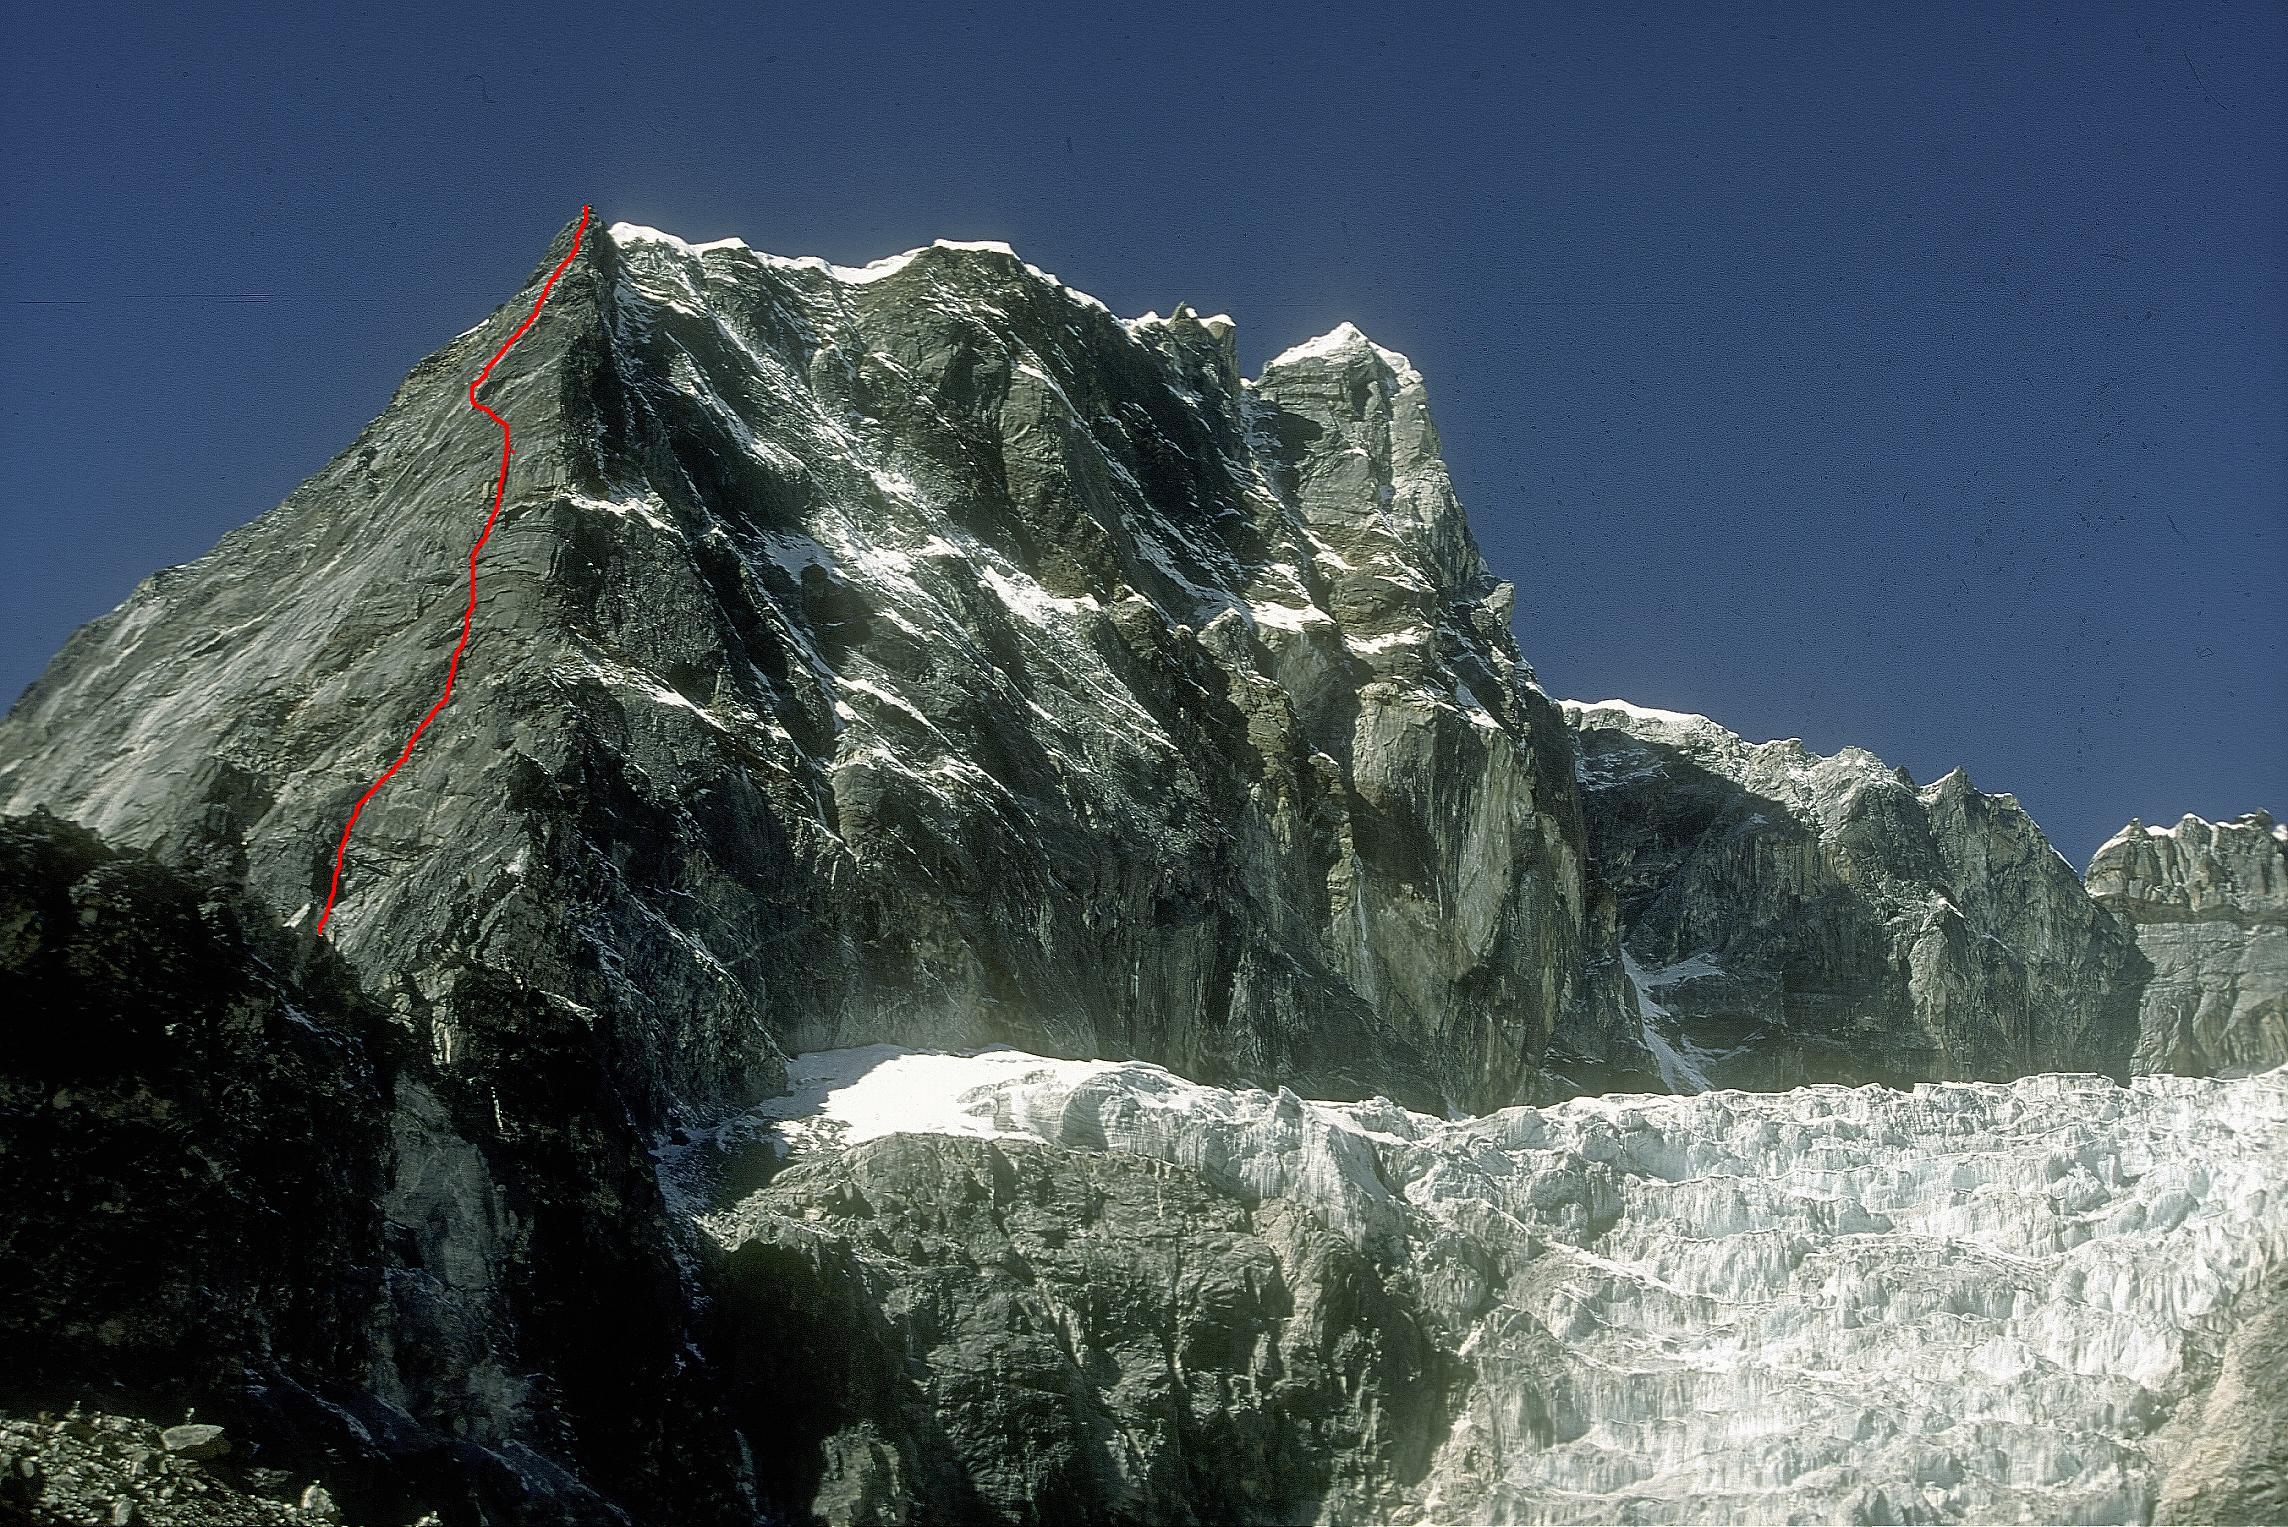 1995 –  Nepal                                     Iland Peack 6189 m. e Lobucke Peack Est 6119 m.